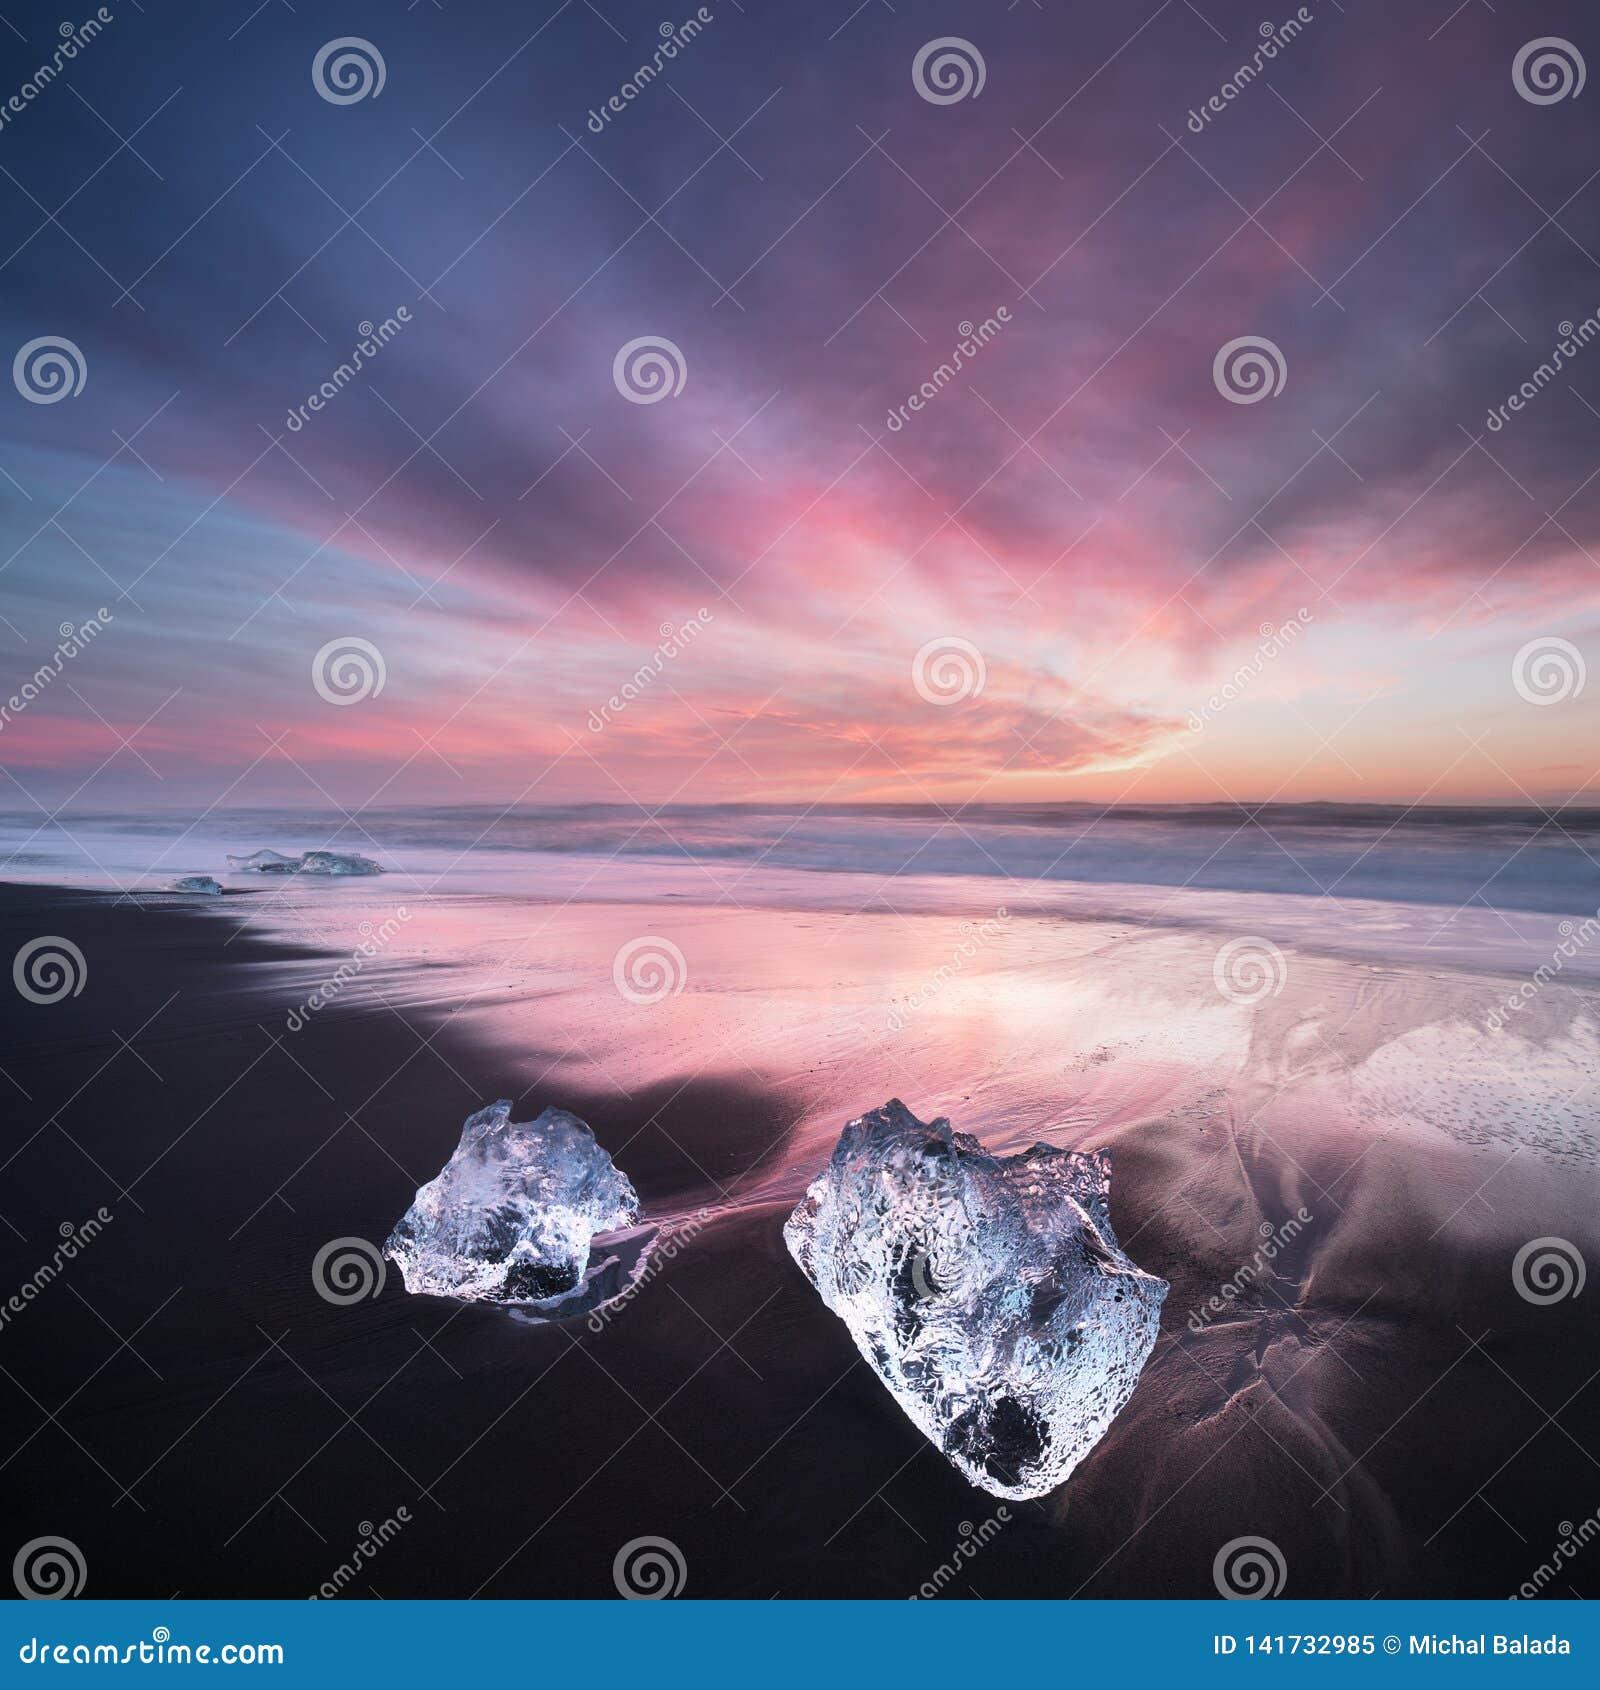 Beautiful sunset over famous Diamond beach, Iceland. This sand lava beach is full of many giant ice gems, Jokulsarlon.